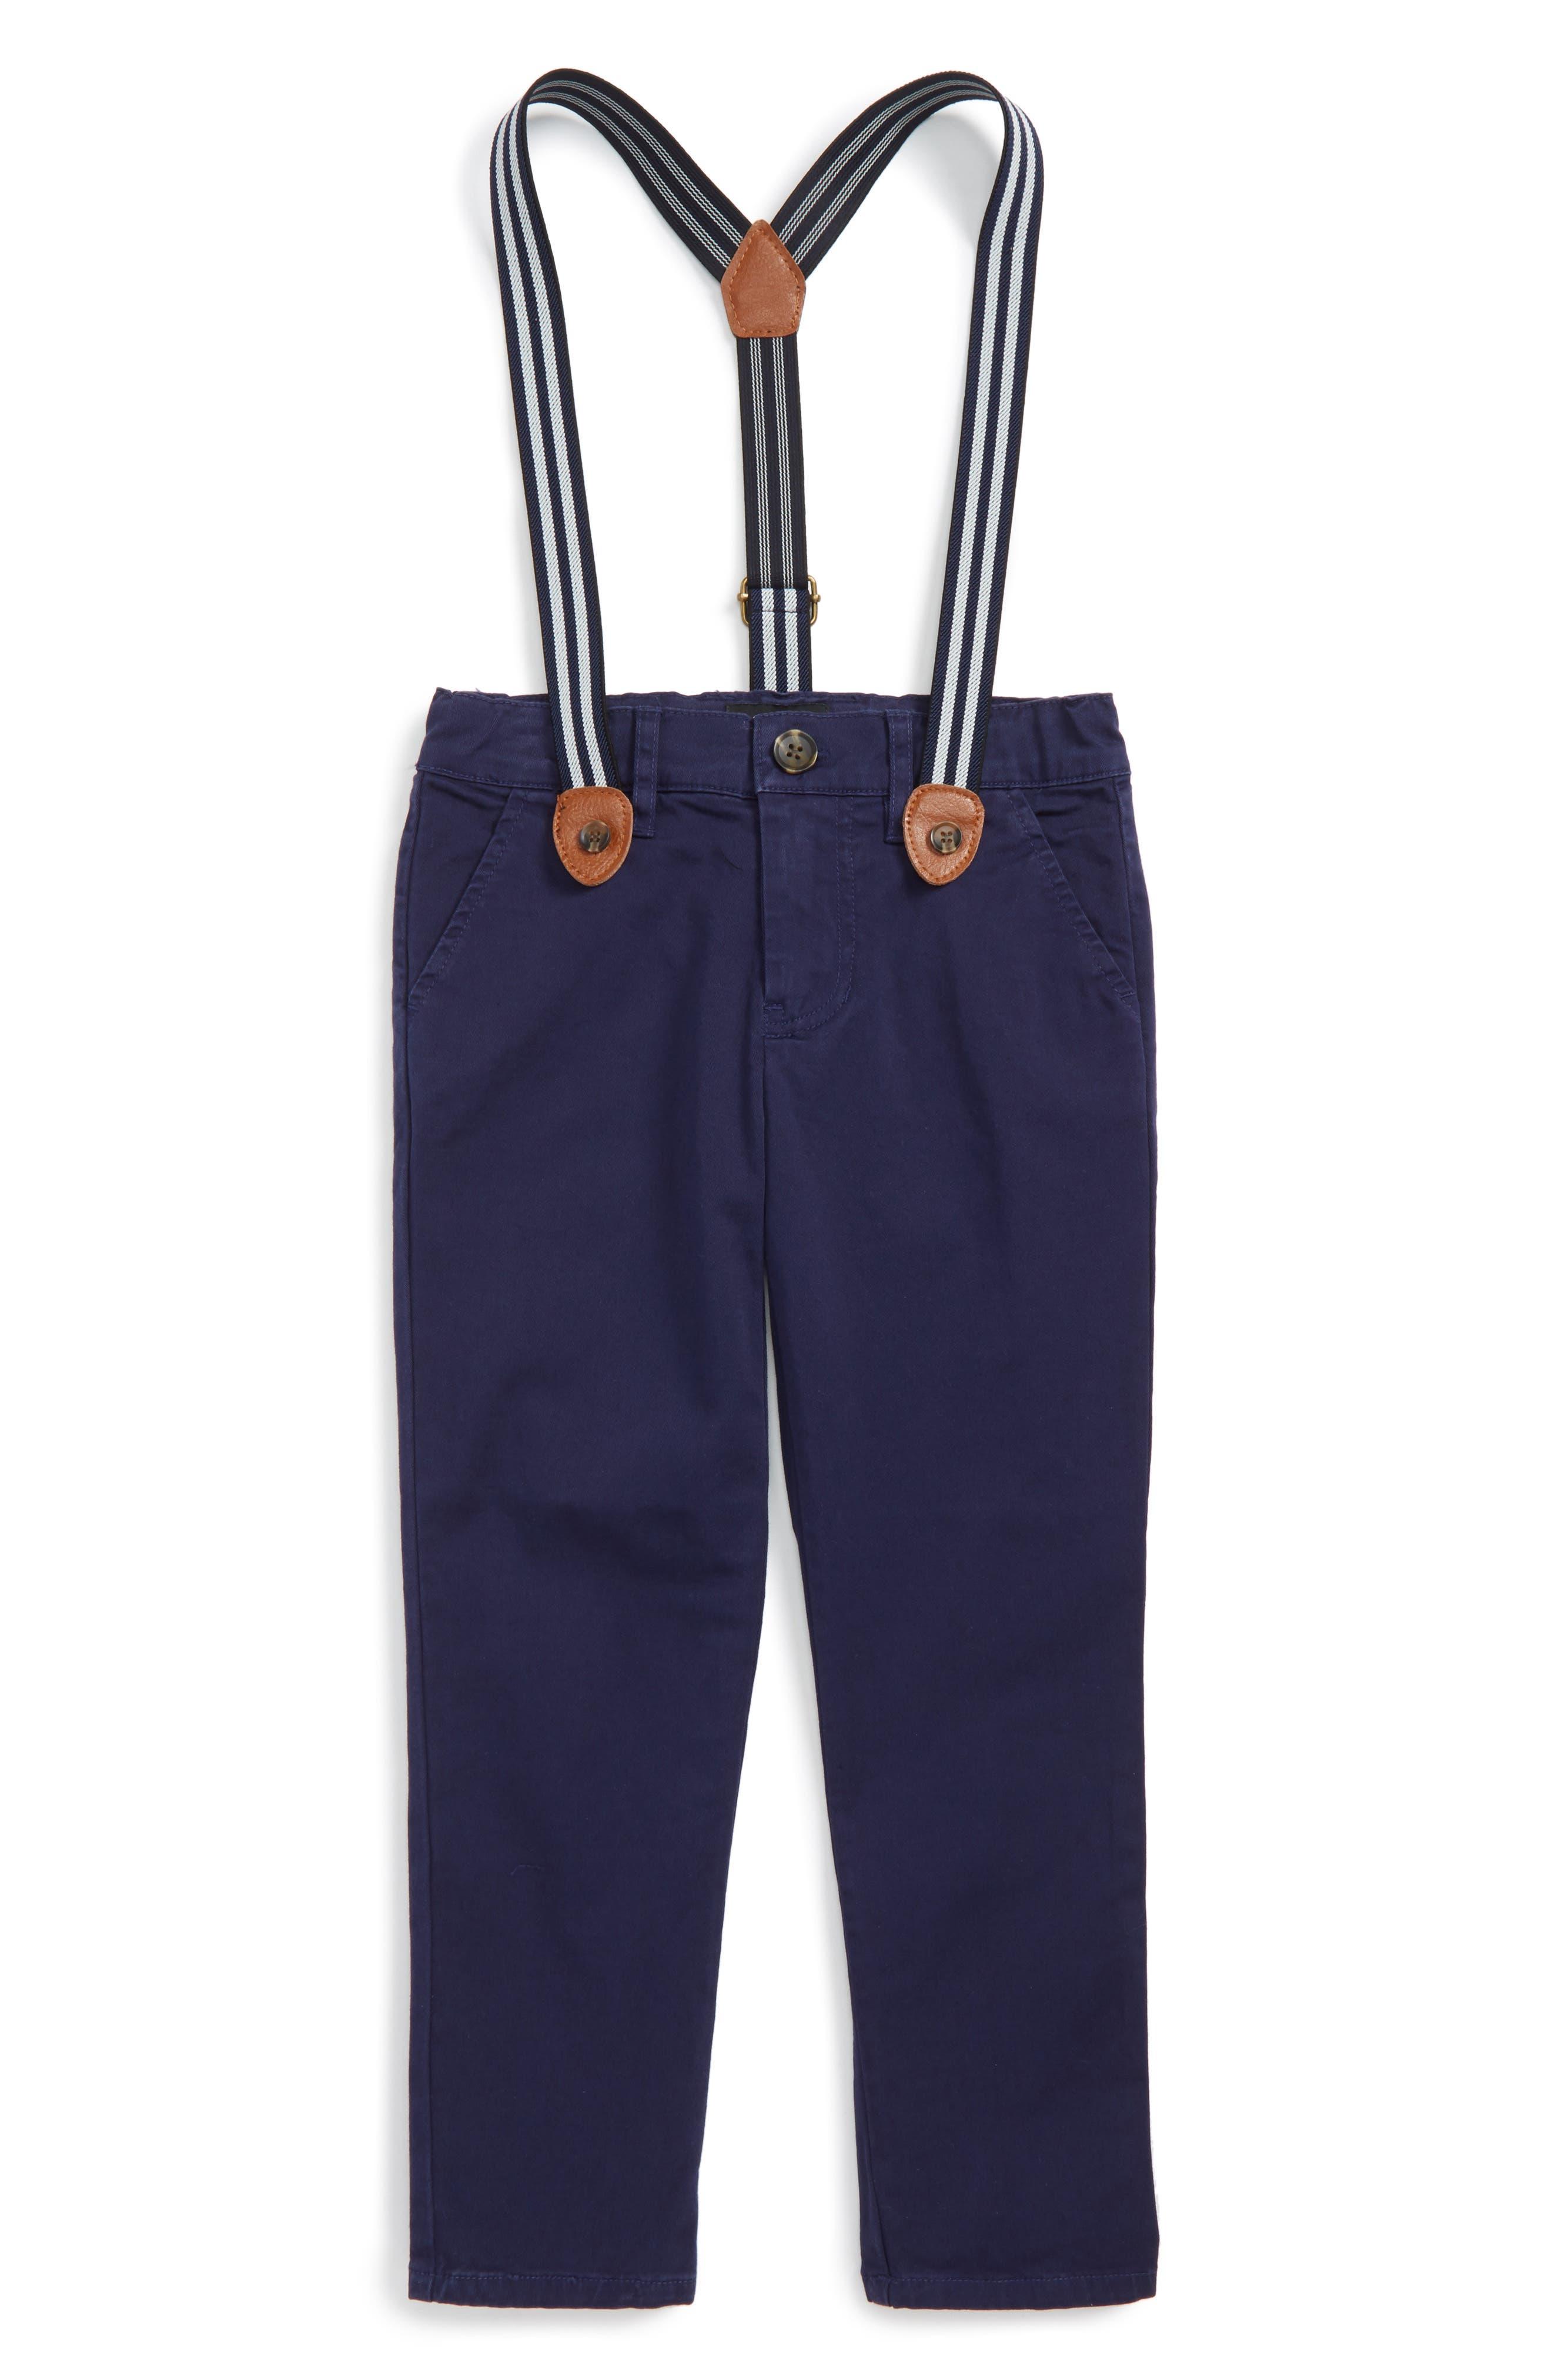 Alternate Image 1 Selected - Bardot Junior Chinos & Suspenders Set (Toddler Boys & Little Boys)